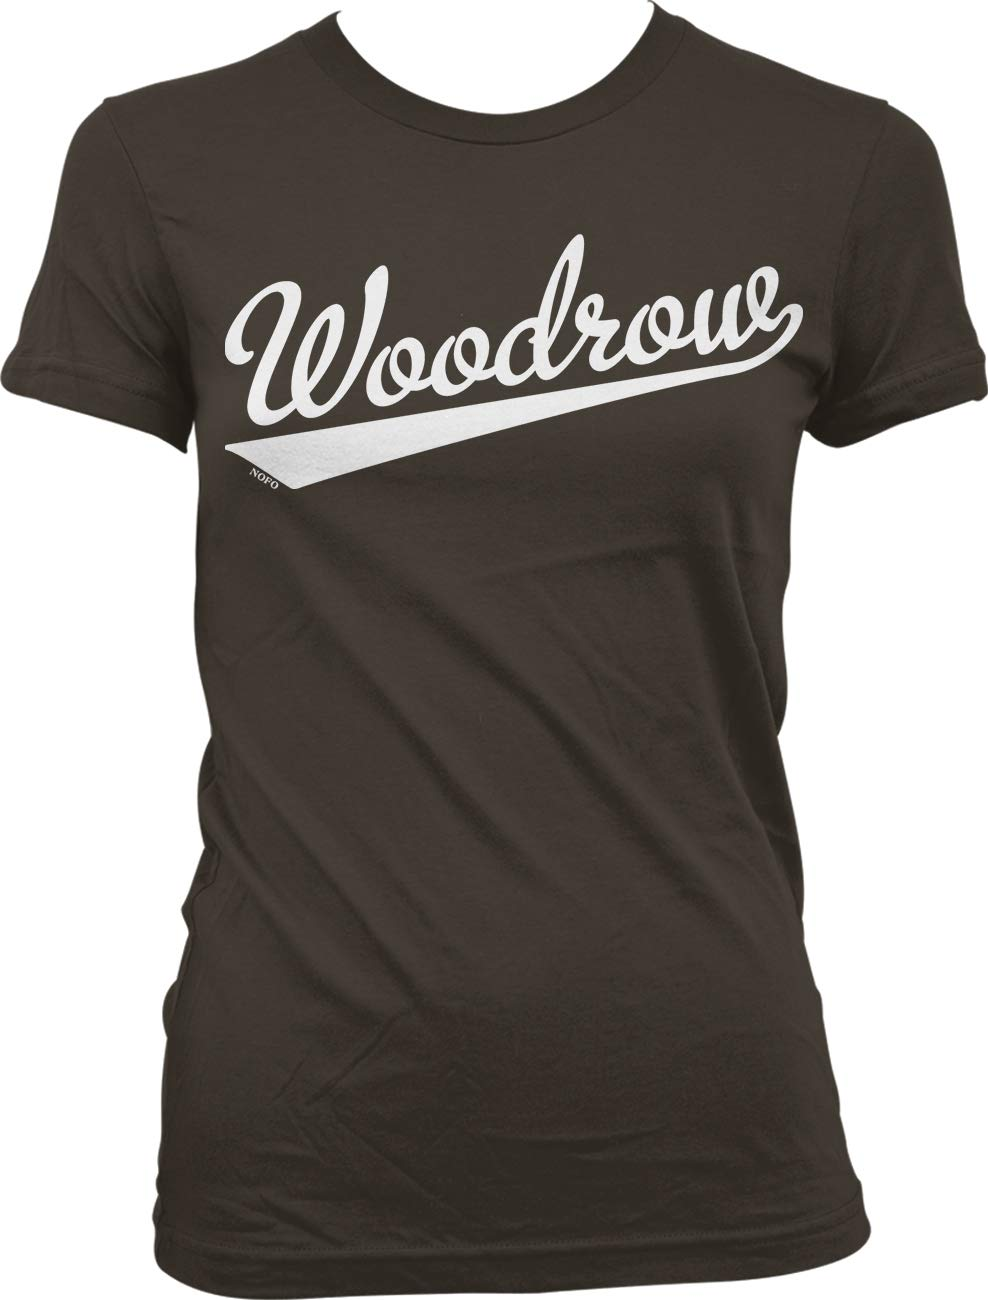 Woodrow Tshirt